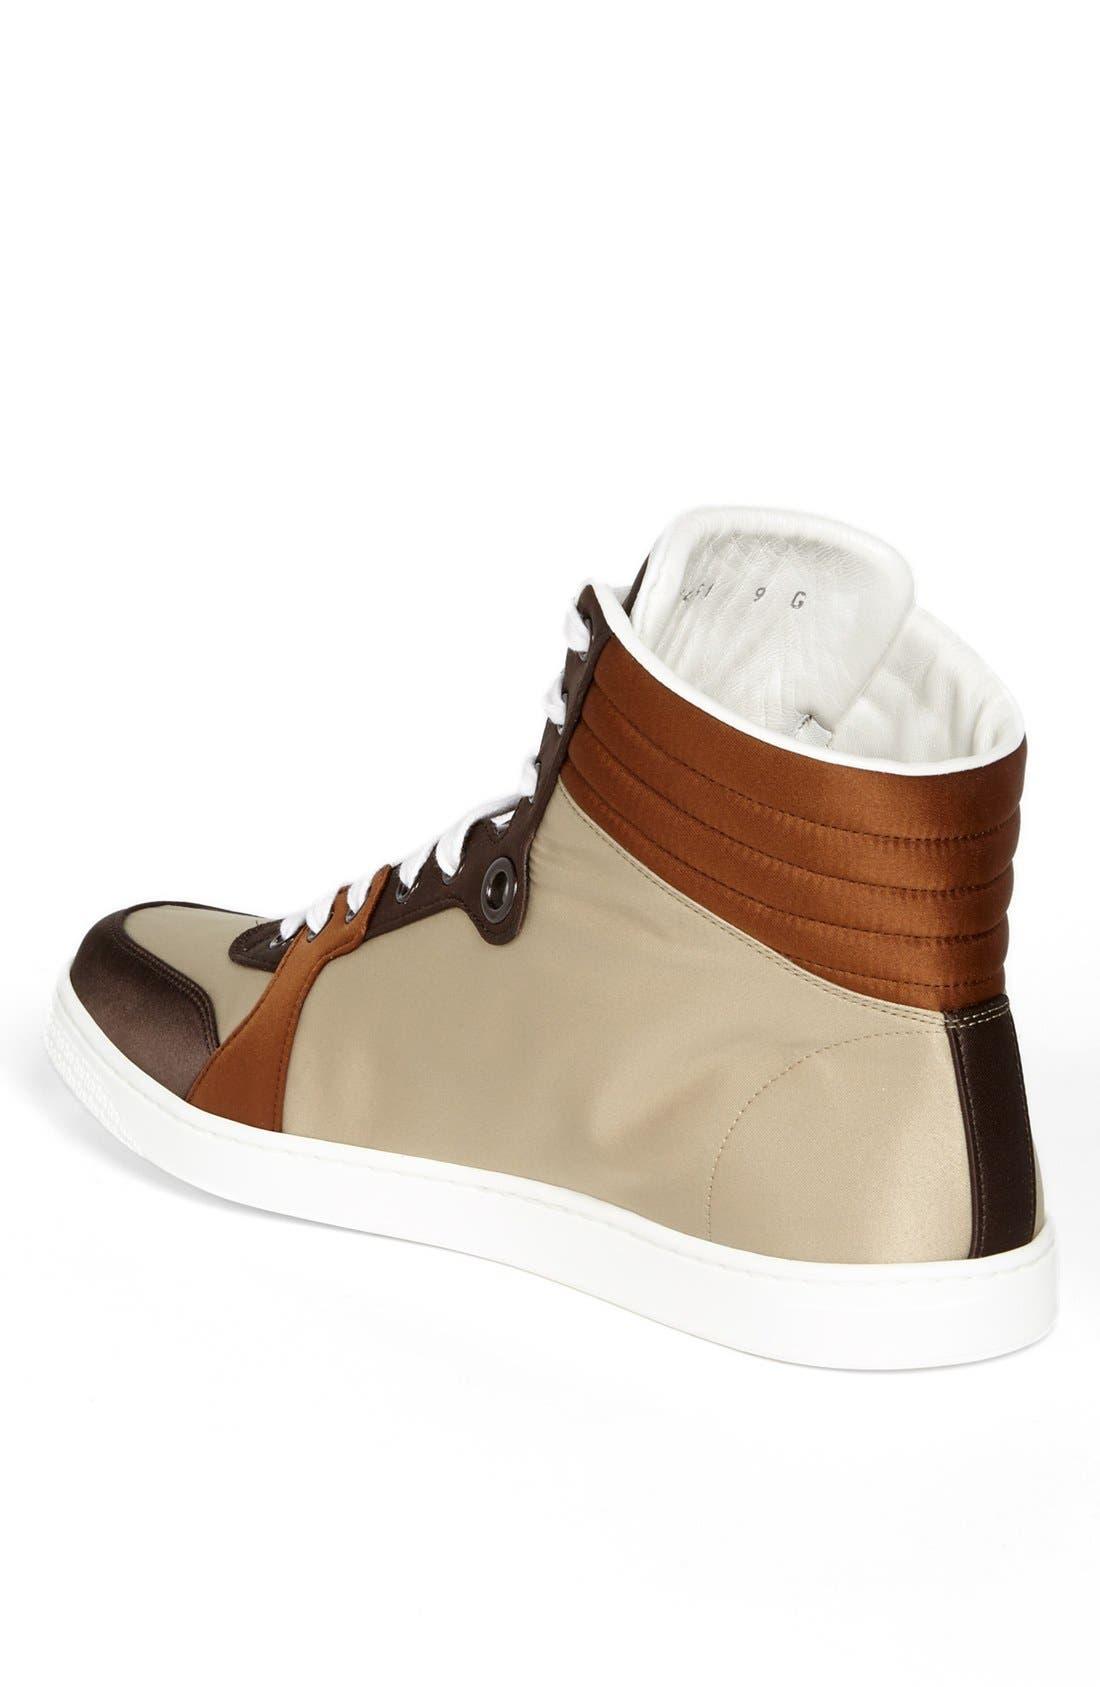 Alternate Image 2  - Gucci 'Coda' Satin High Top Sneaker